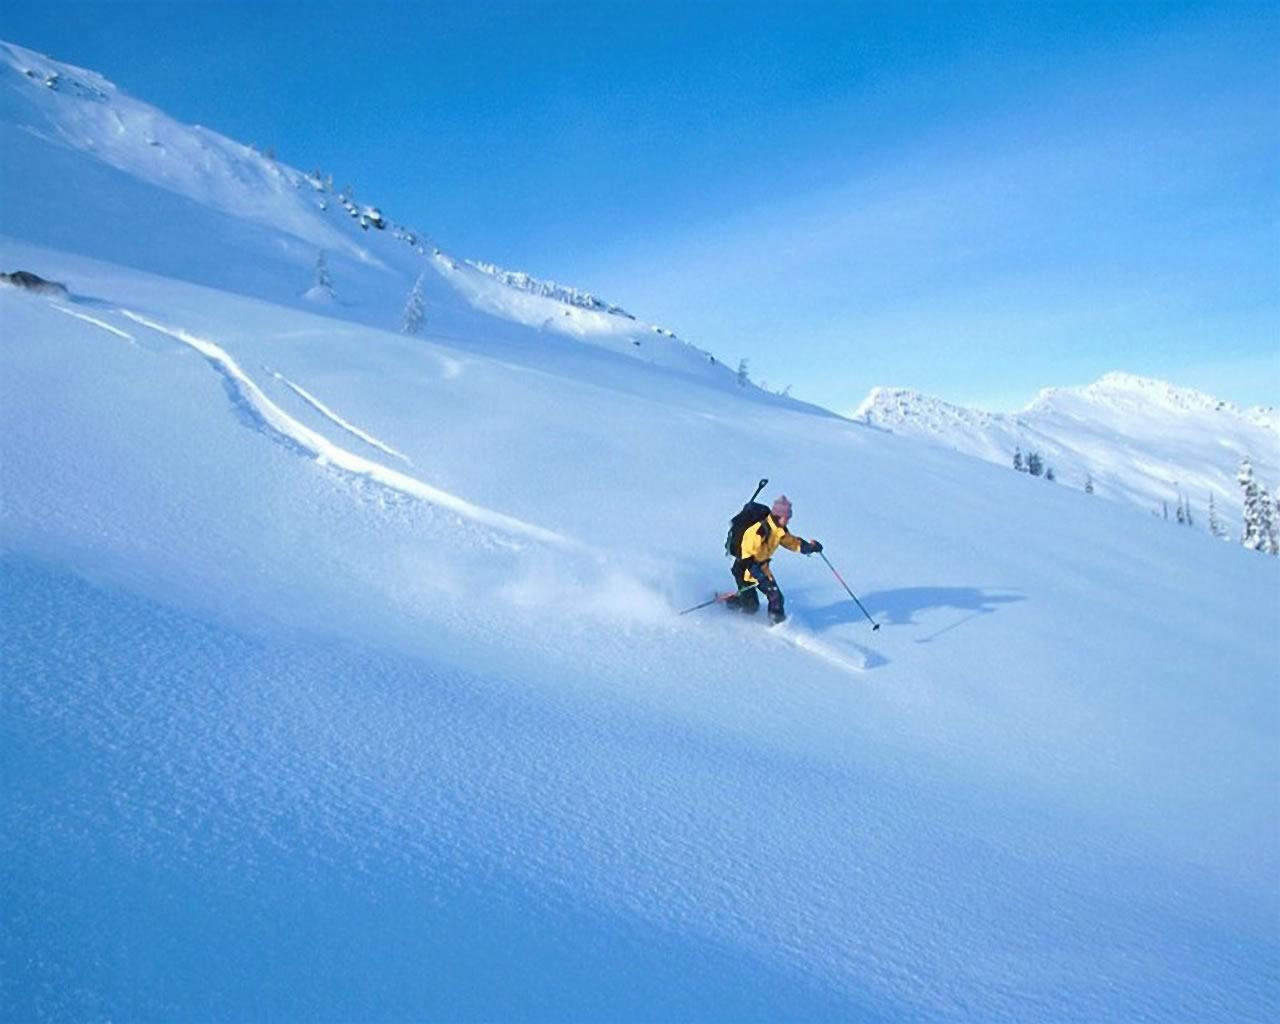 Club Med Yabuli Ski 6 Days tour and 5 Nights Holiday